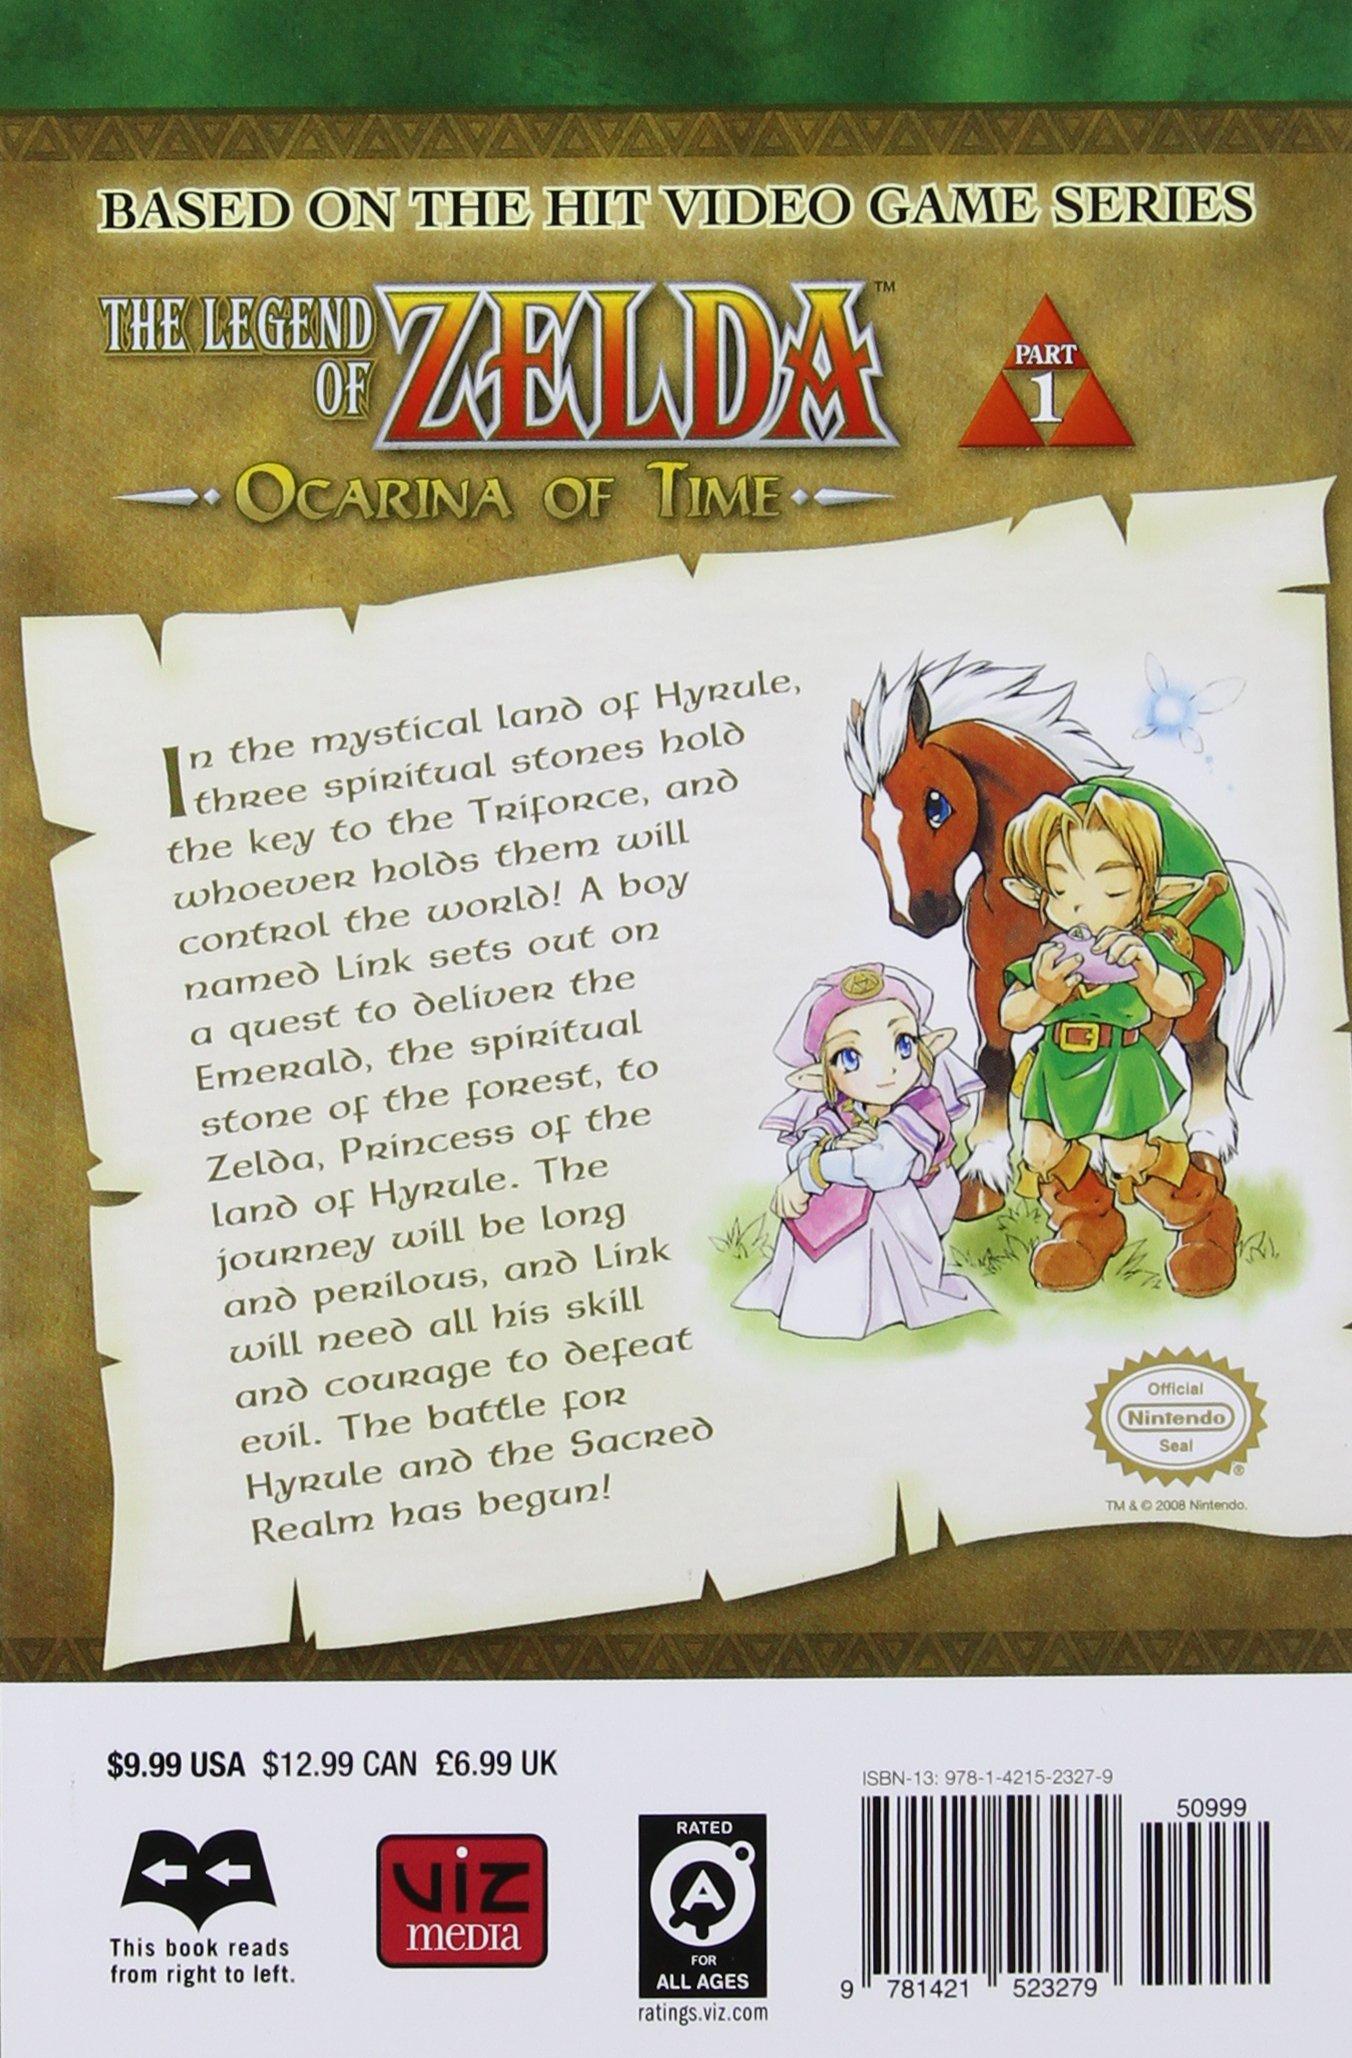 Legend Of Zelda Box Set The Legend of Zelda Idioma Inglés: Amazon.es: Himekawa, Akira: Libros en idiomas extranjeros